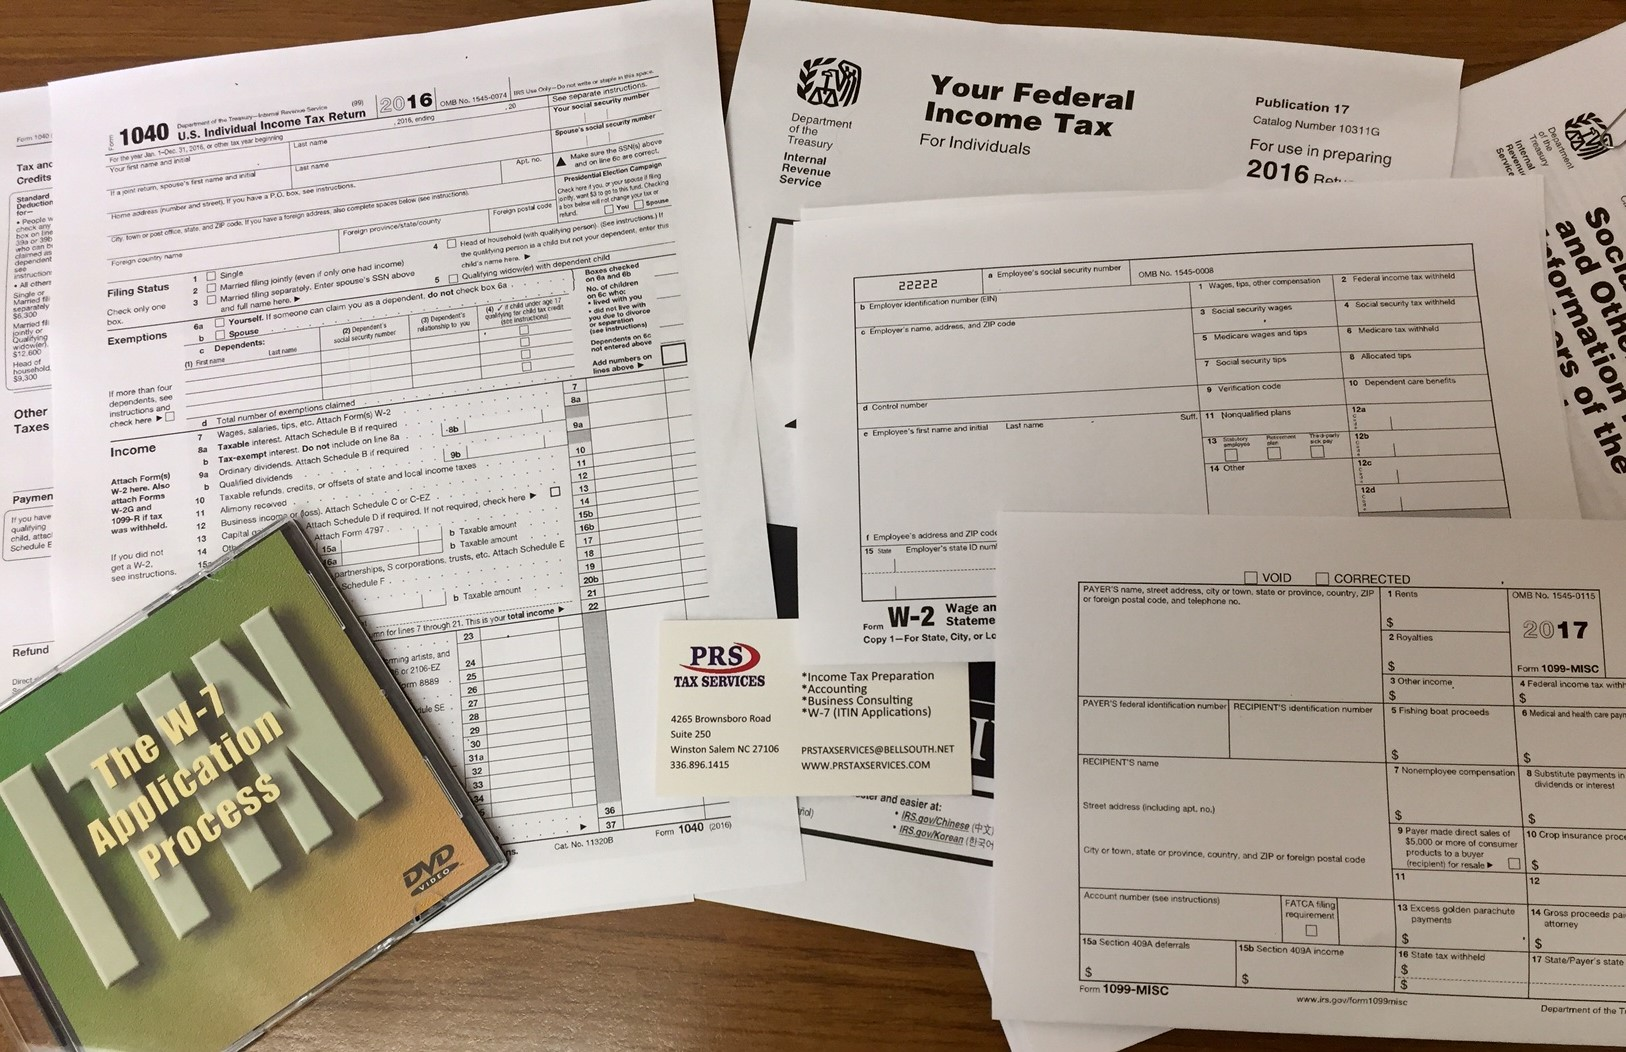 PRS Tax Services